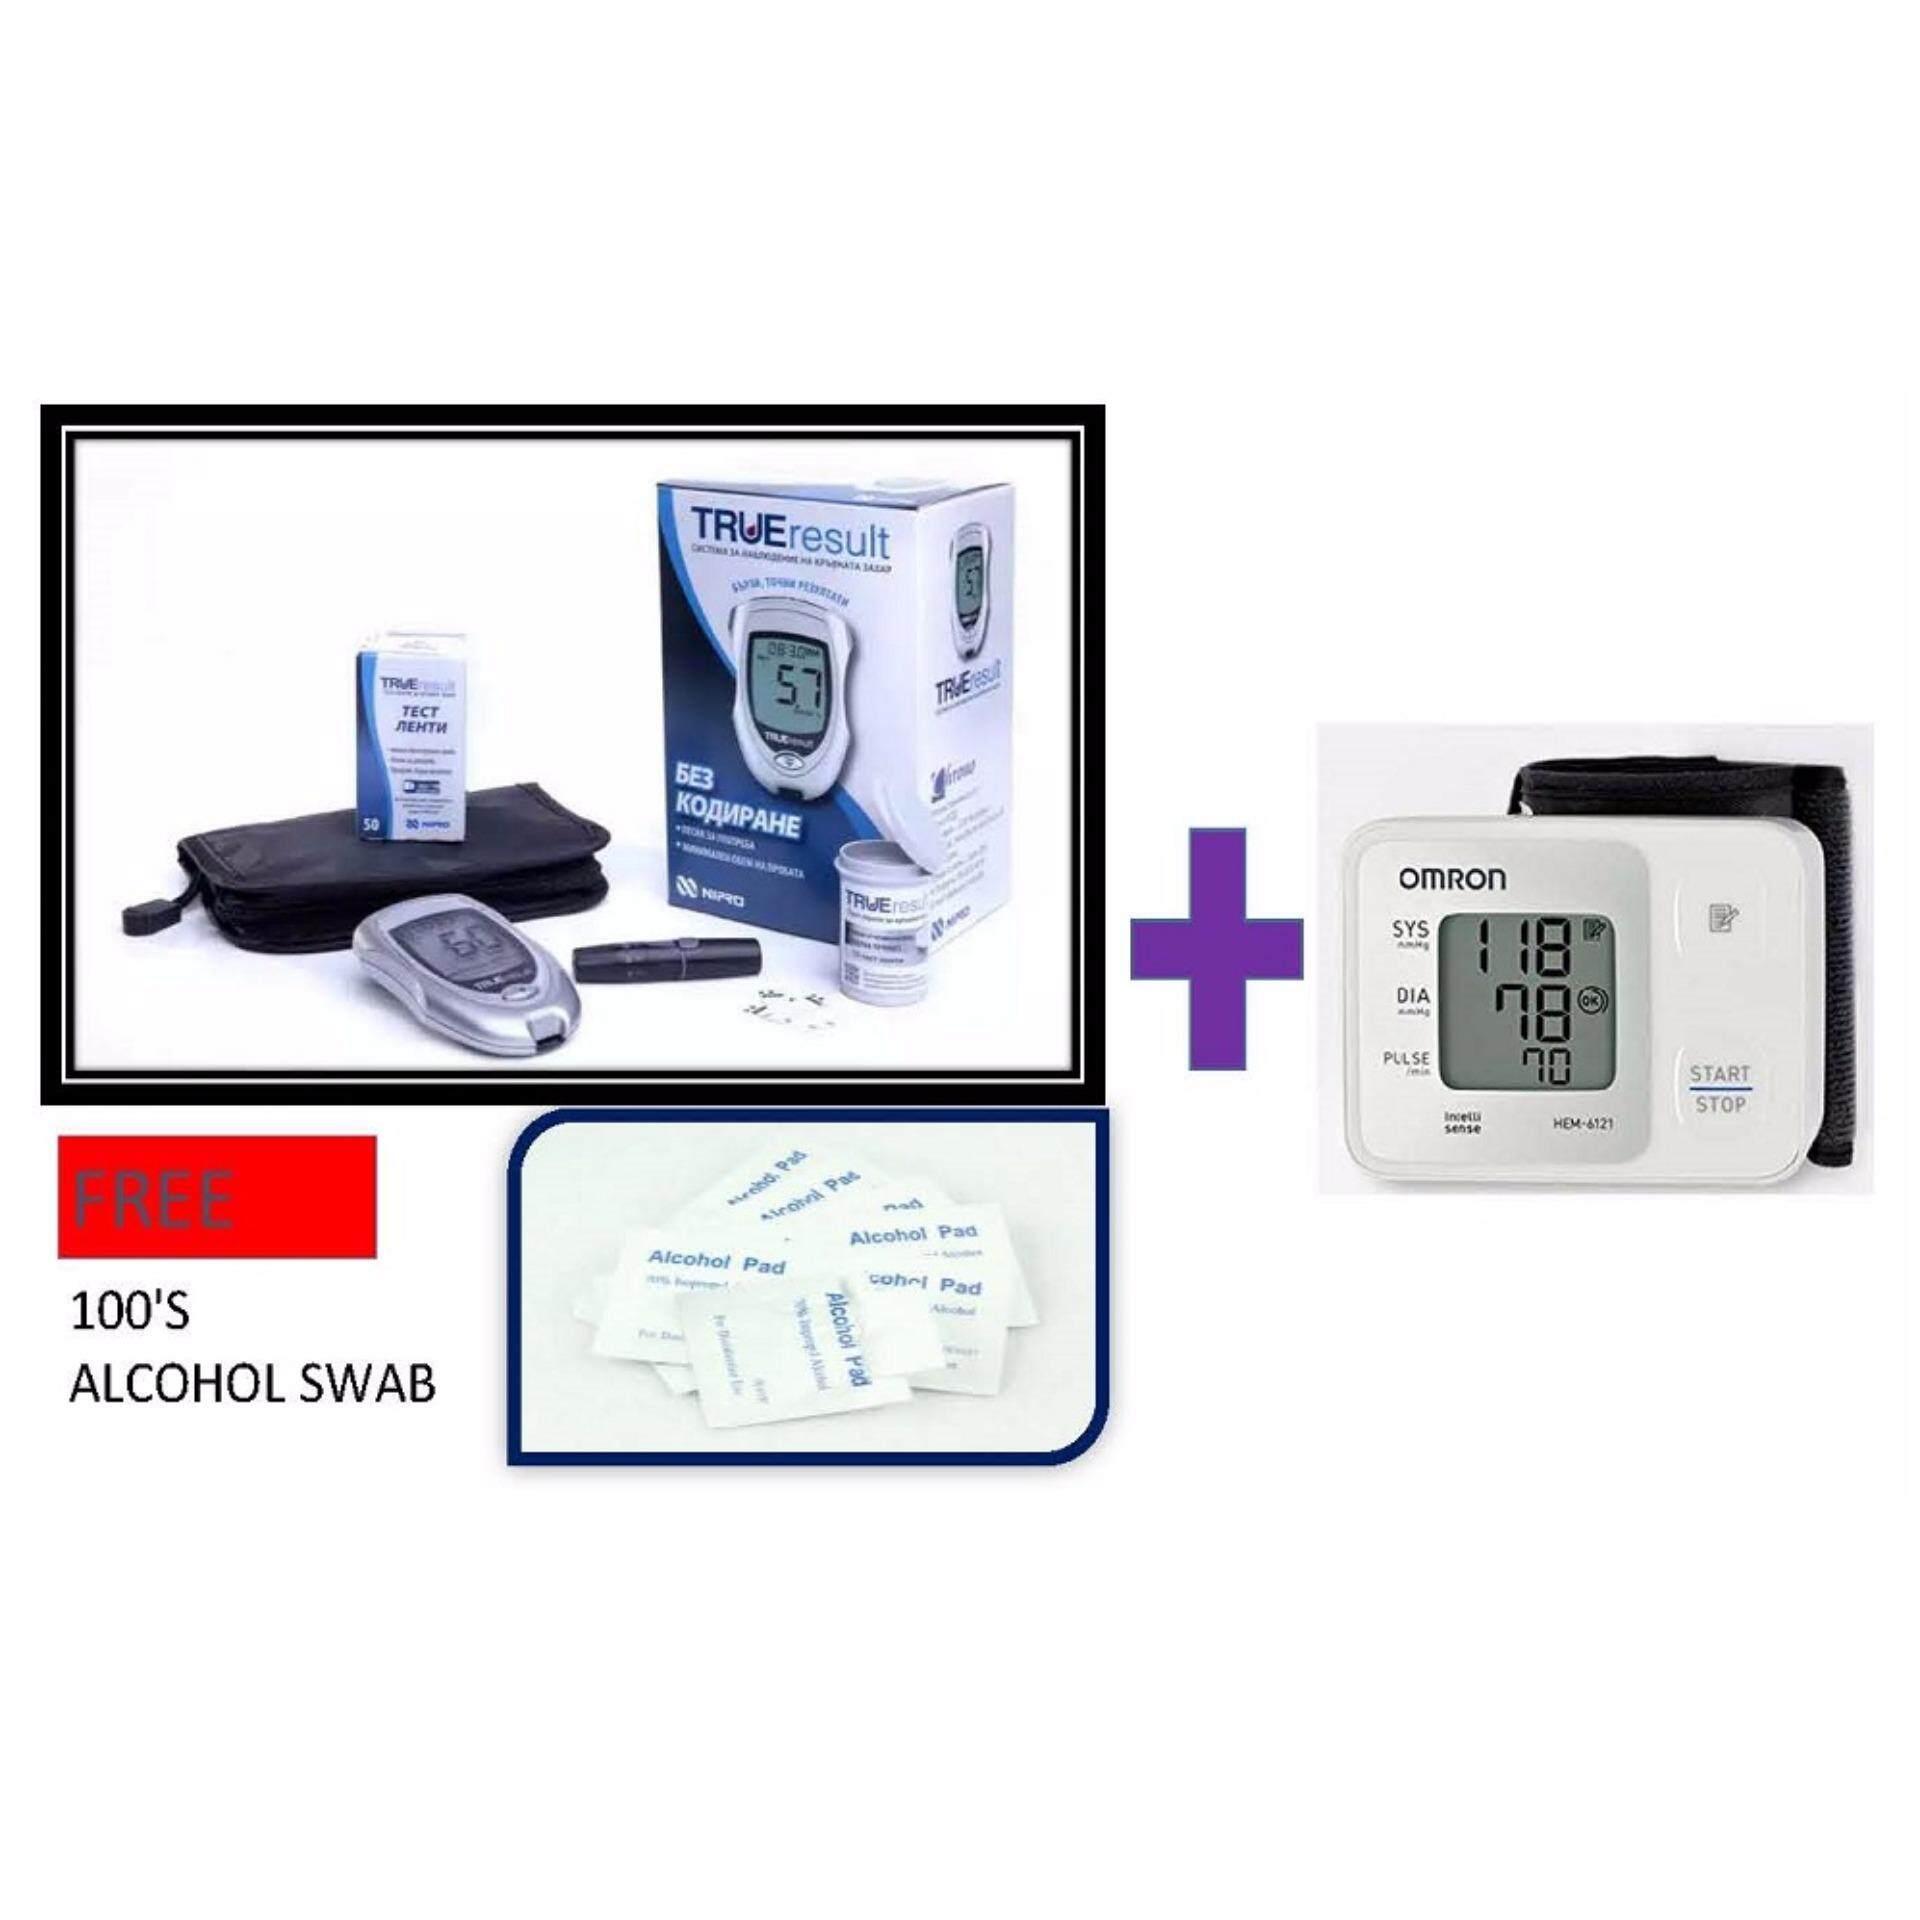 Nipro True Result (Lifetime warranty) Blood Glucose Meter Monitor Glucometer With 50 strips + (Original) Omron HEM-6121 Wrist Blood Pressure Monitor (5 Years Warranty) FOC 100's Alcohol Pads